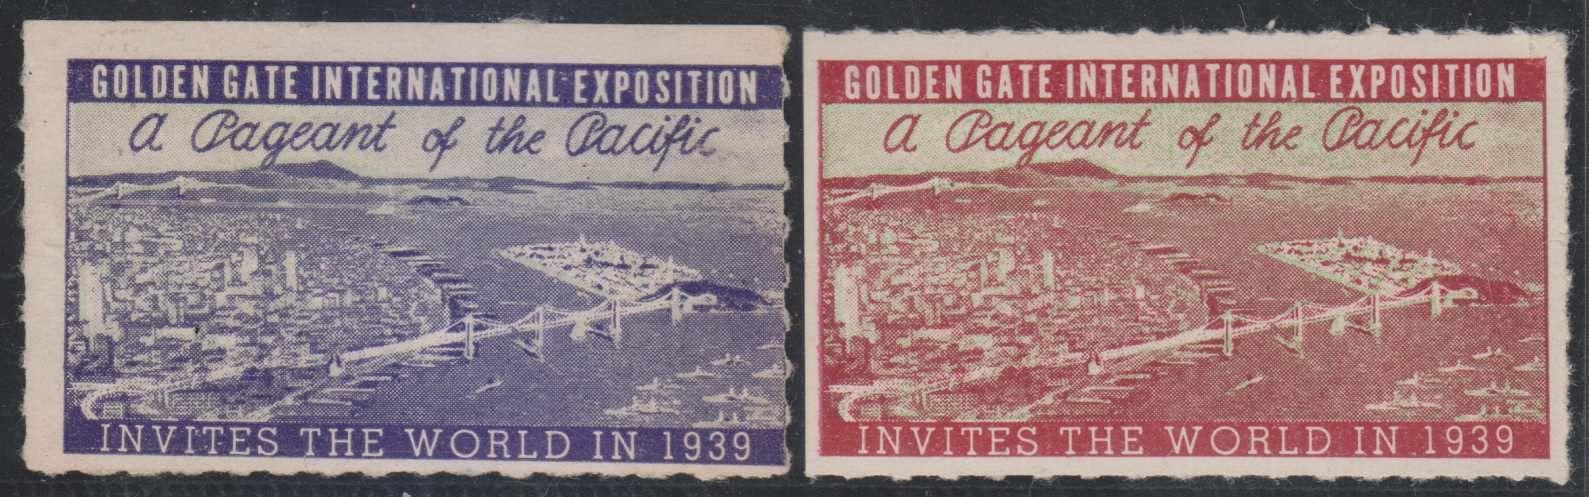 CINDERELLA. 1939. Golden Gate International Exposition.